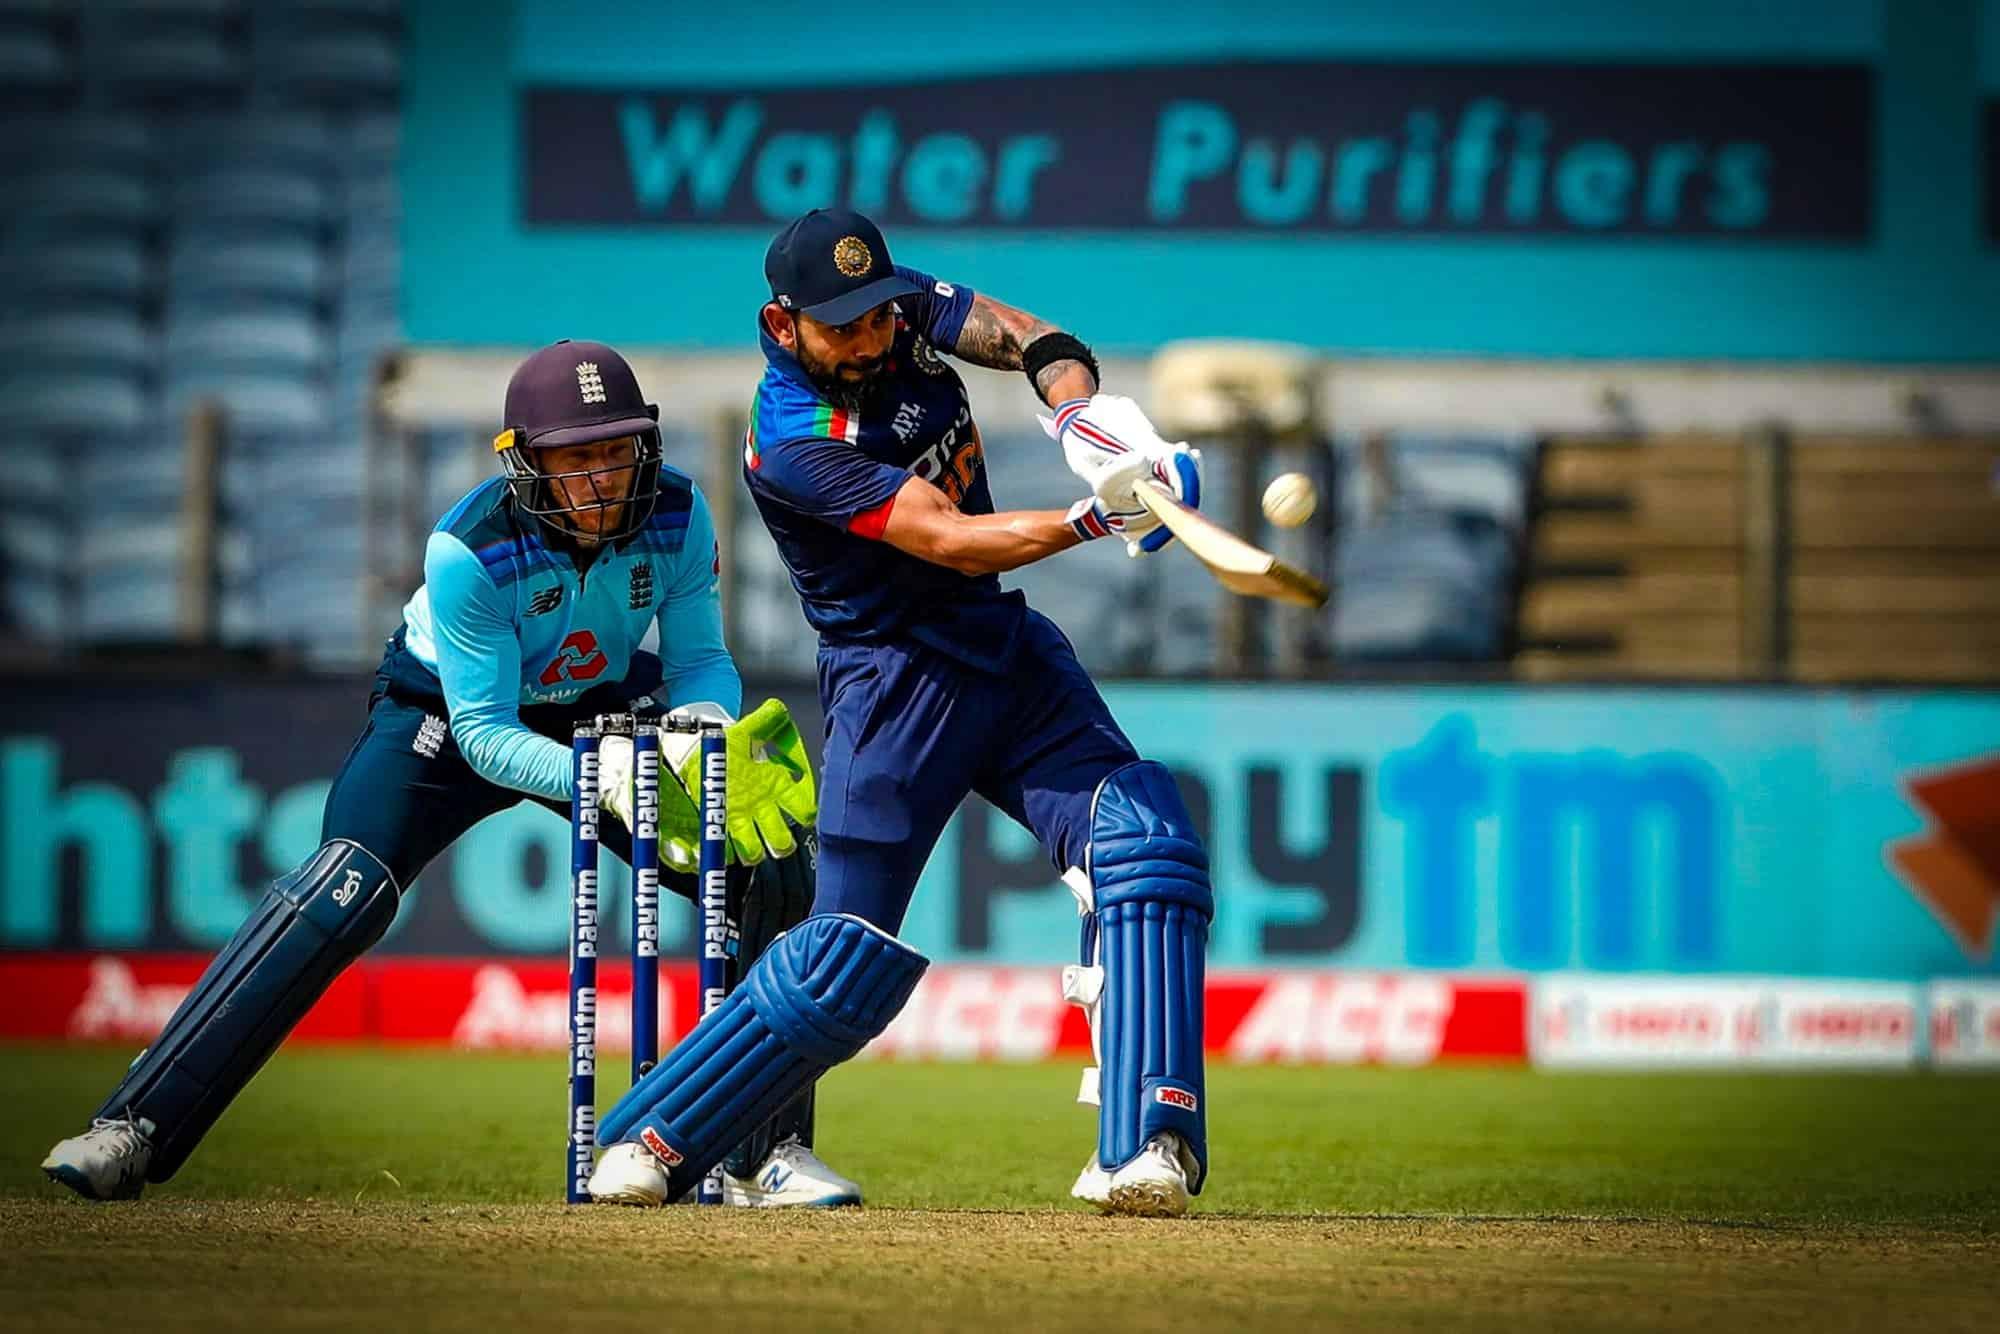 Virat Kohli Completes 10,000 Runs While Batting At Number 3